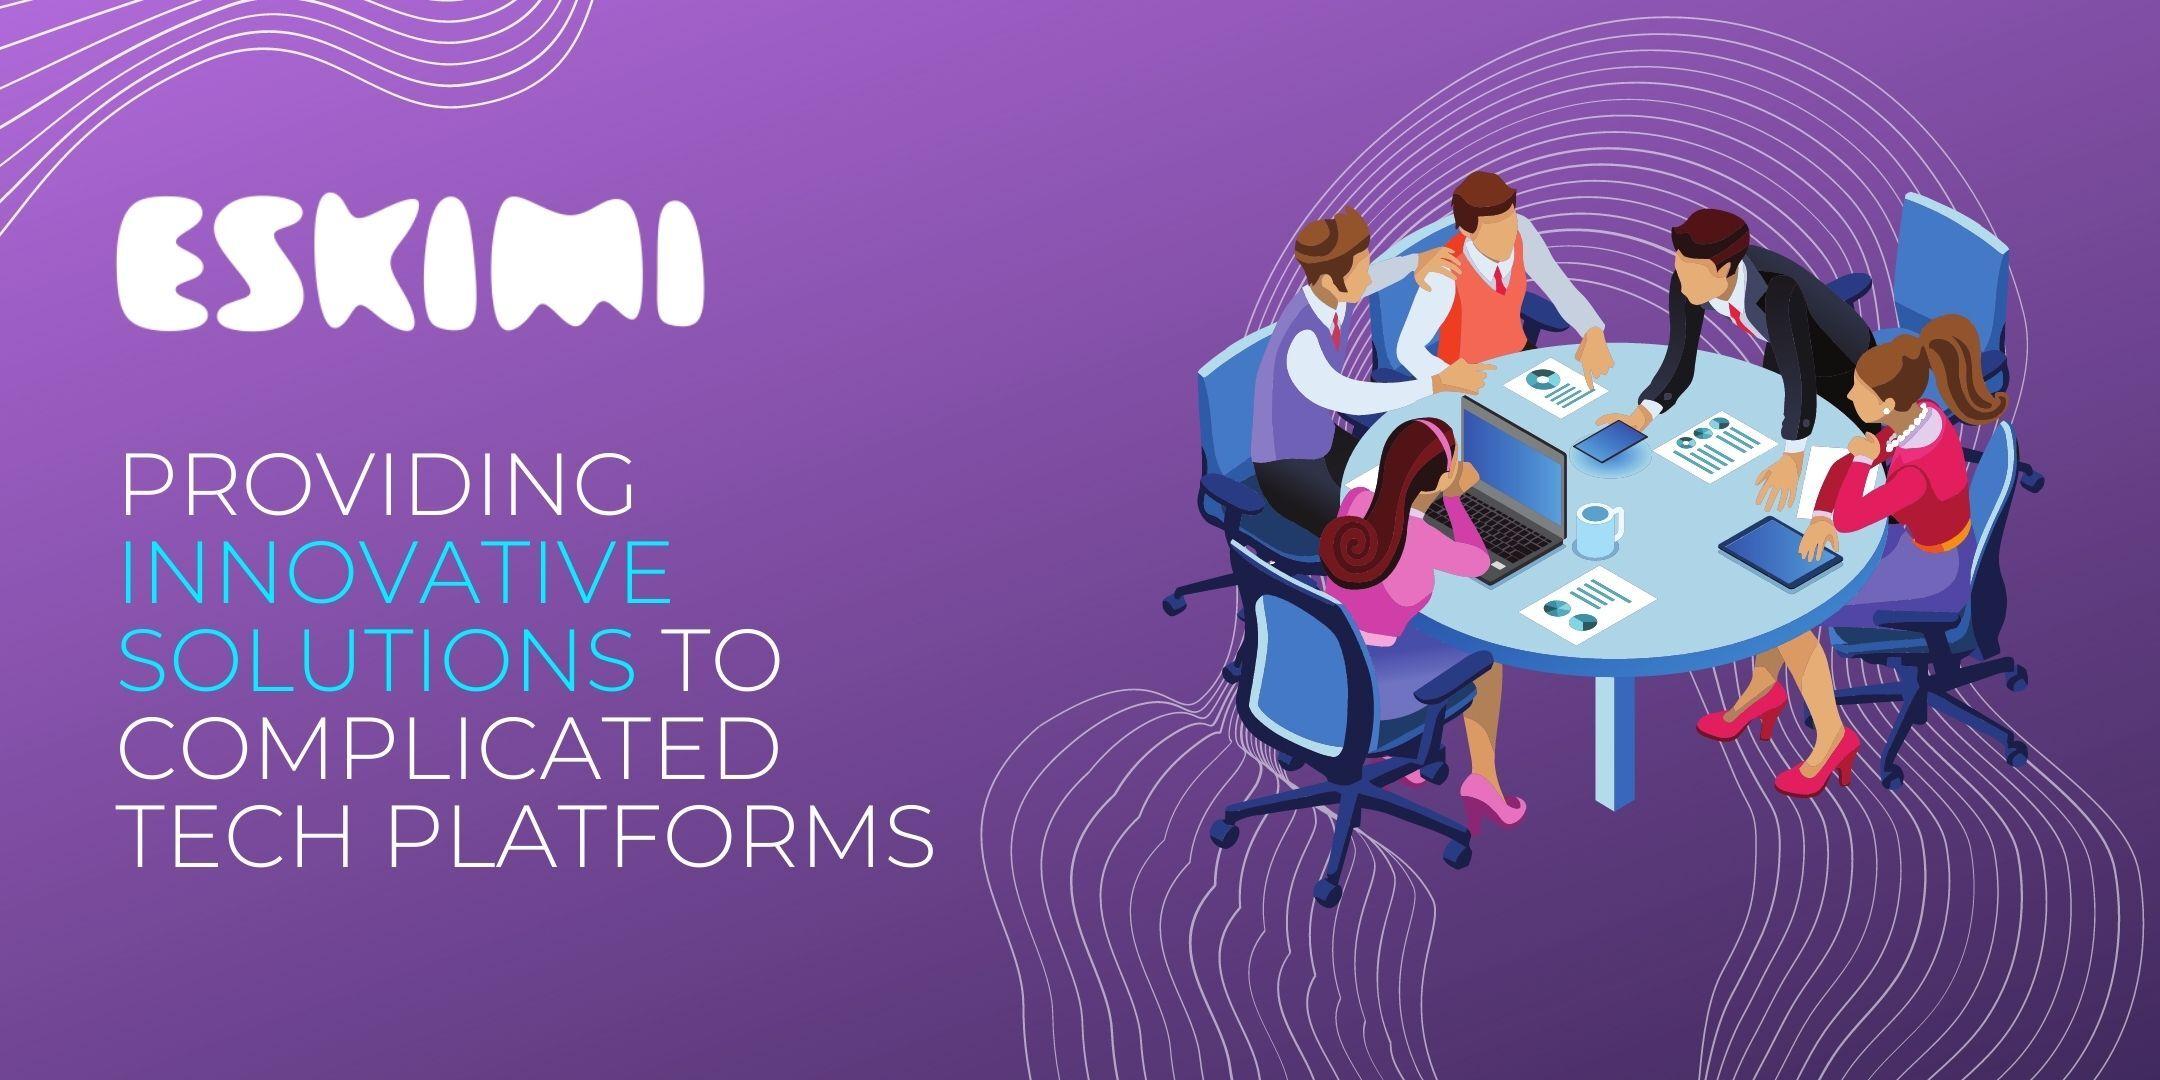 Eskimi Provides Innovative Solutions to Complicated Tech Platforms